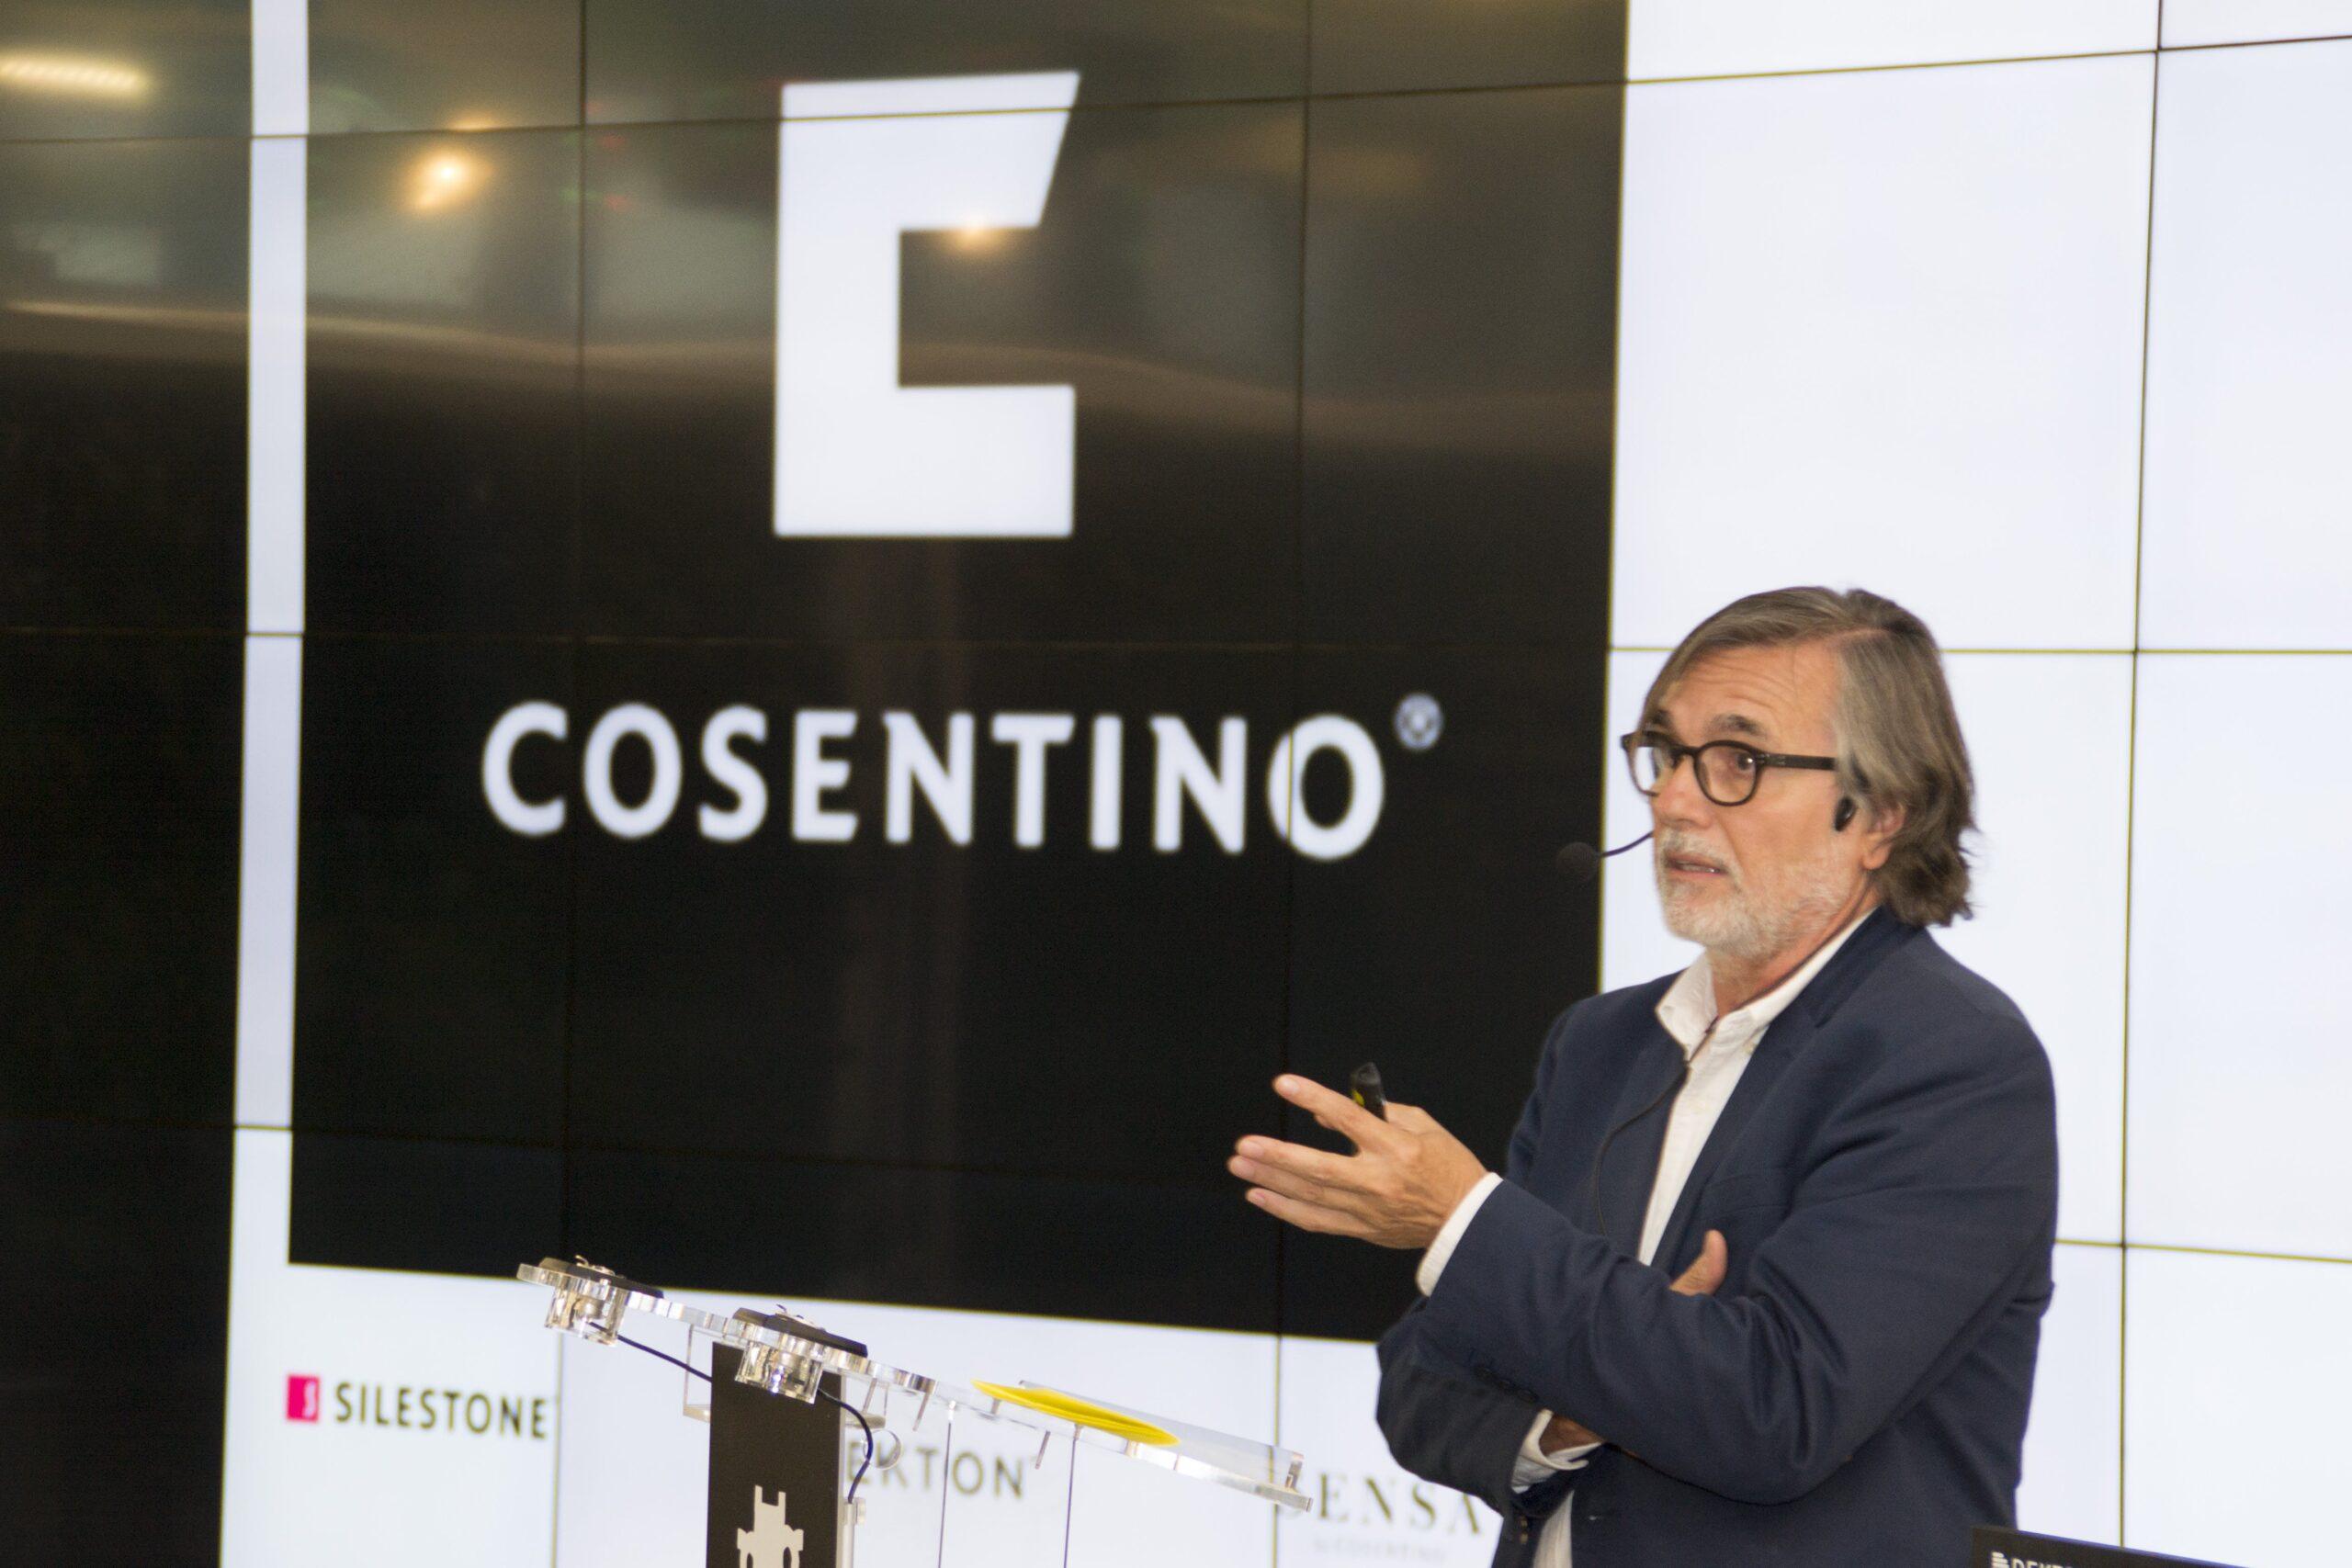 Image of Francisco Xavier Ferrés Acto Cosentino Tabakalera 1 scaled in Cosentino discusses architecture and façades at San Sebastián - Cosentino